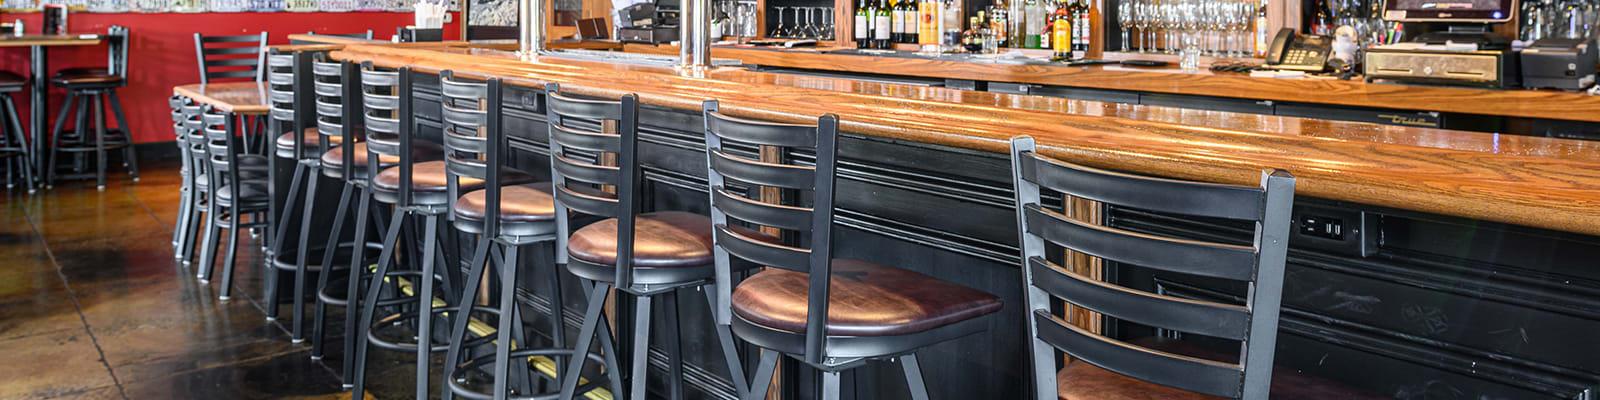 metal swivel bar stools for restaurants